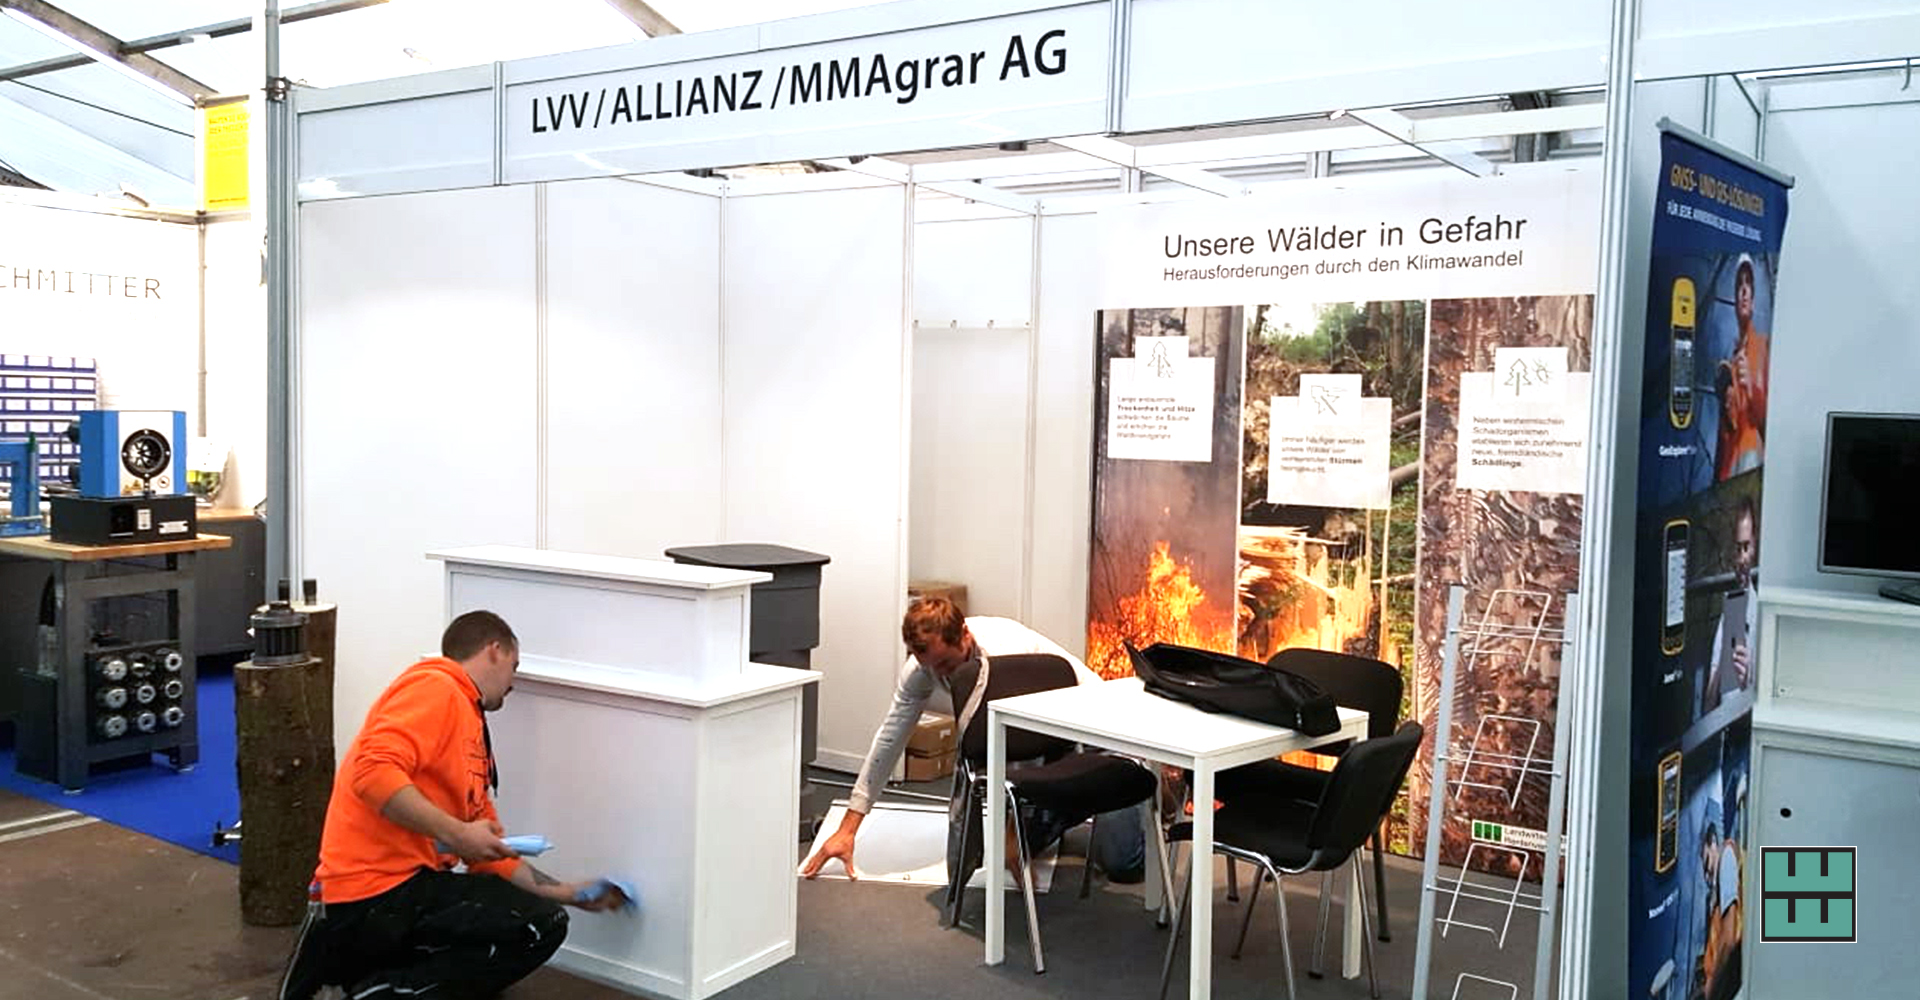 DLG Waldtage 2019 Weber Werbung Mietmöbel Messebau Beschriftungen Lichtenau Westfalen LVV Allianz MMAgrar AG